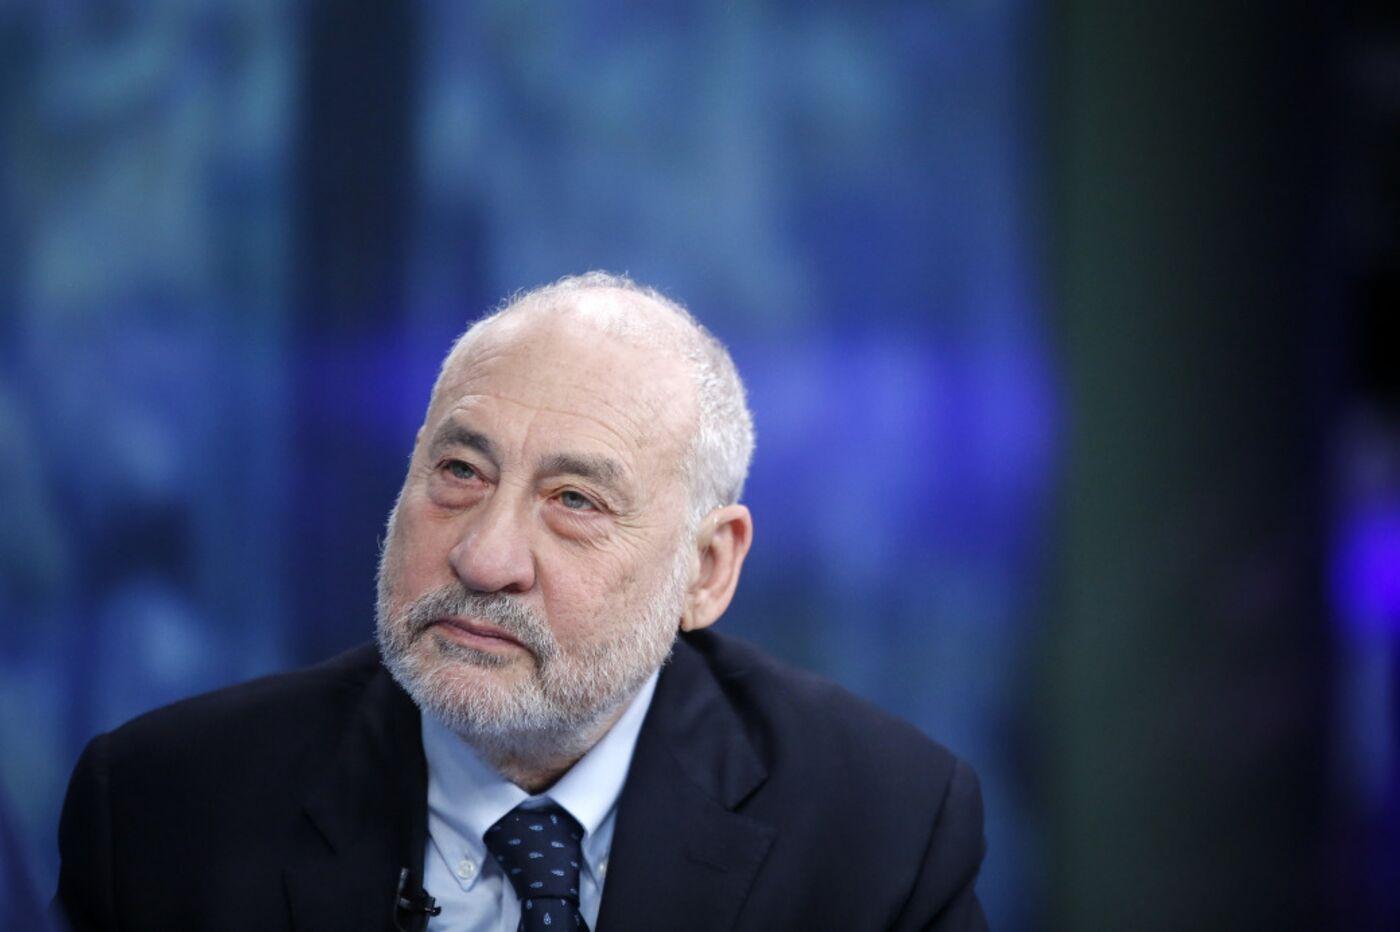 Nobel Prize - Winning Economist And Columbia University Professor Of Economics Joseph Stiglitz Interview